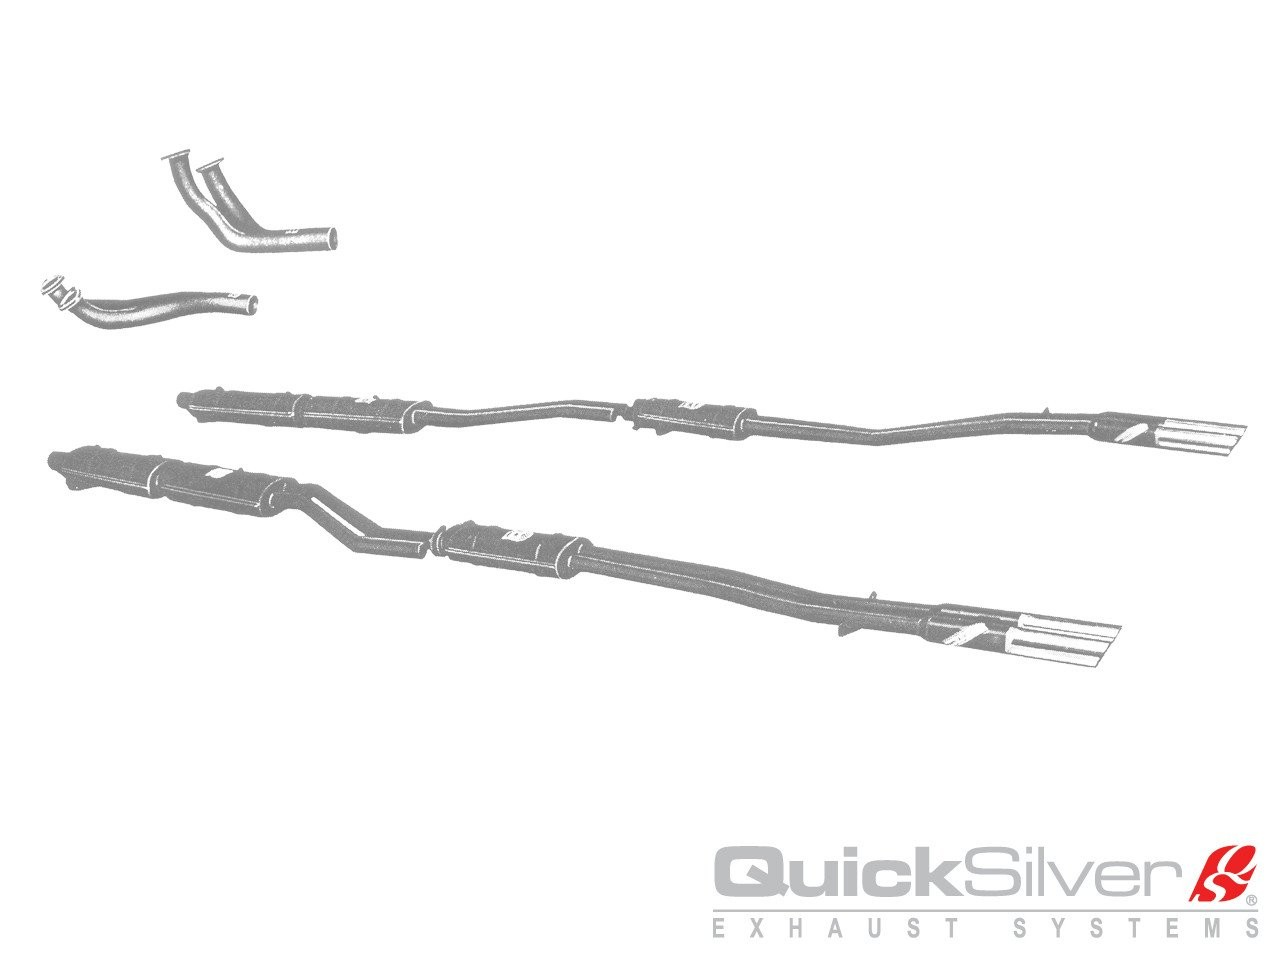 QuickSilver Exhausts Heritage | Ferrari 330 America, 1964-65, FE063 (Výfukový systém – nerezová ocel)